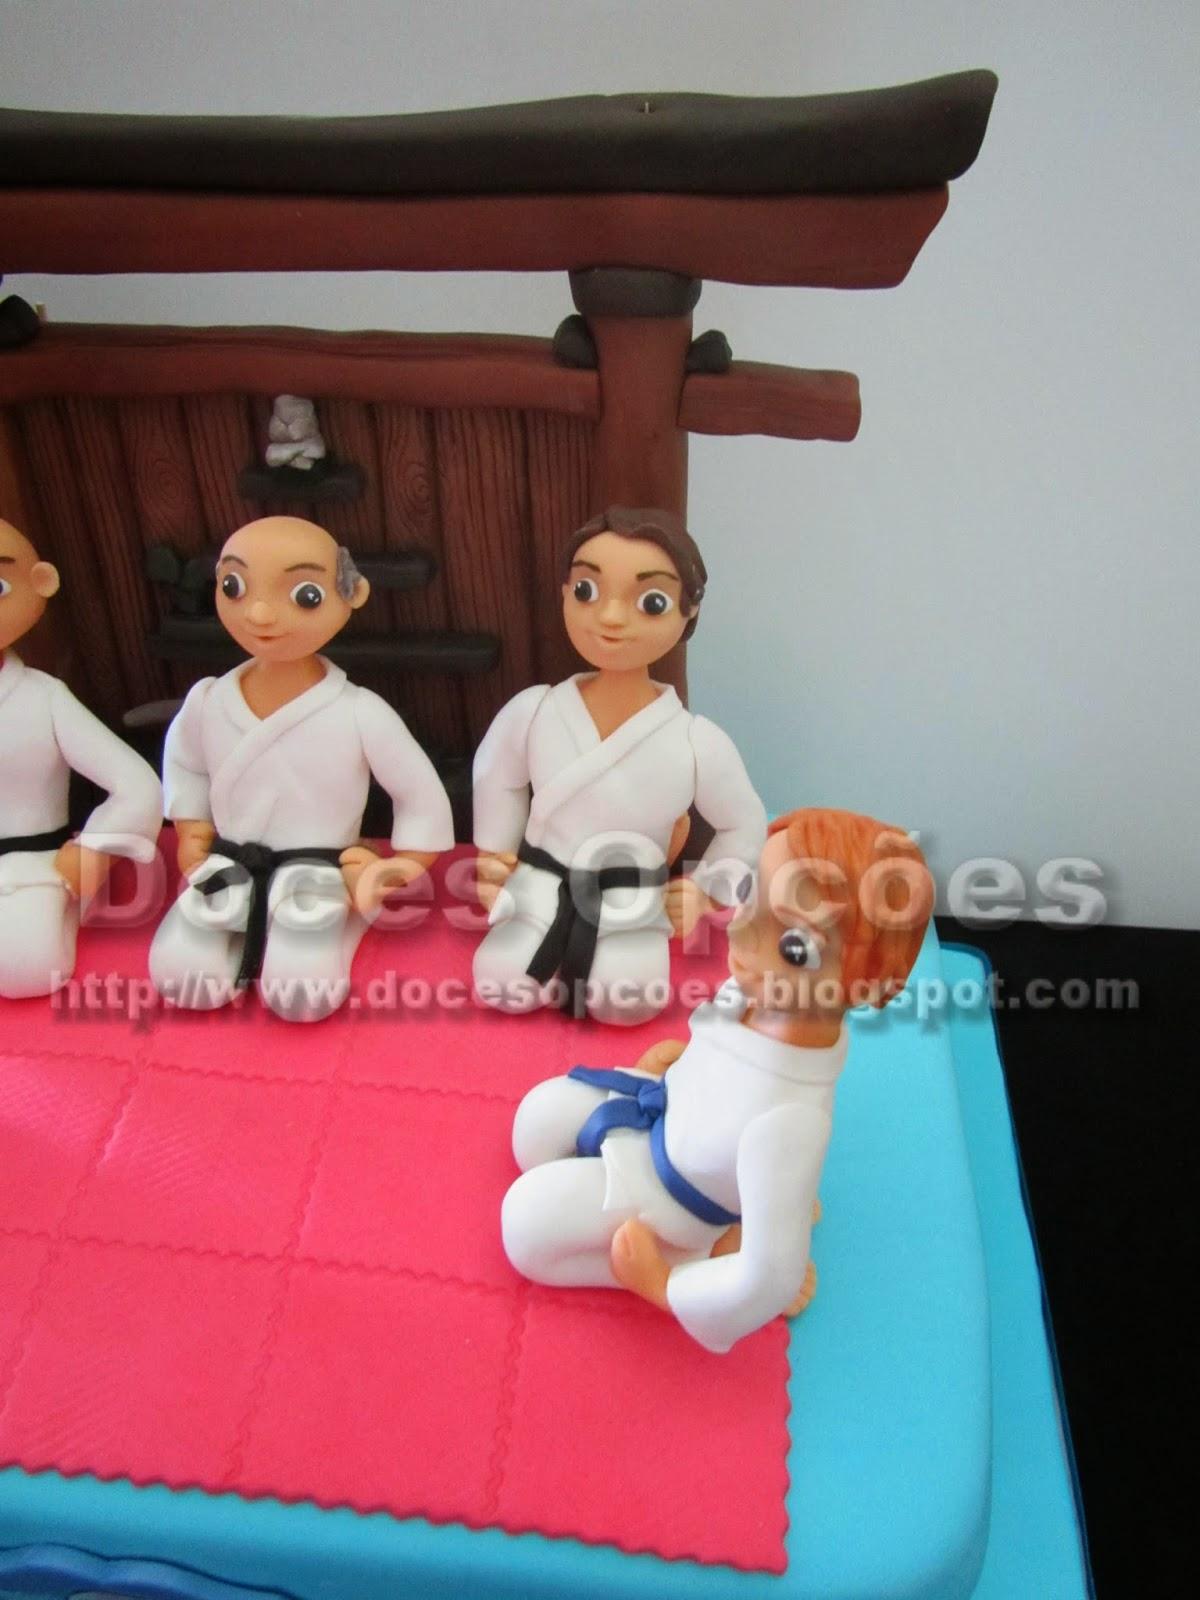 bolo meninos judo